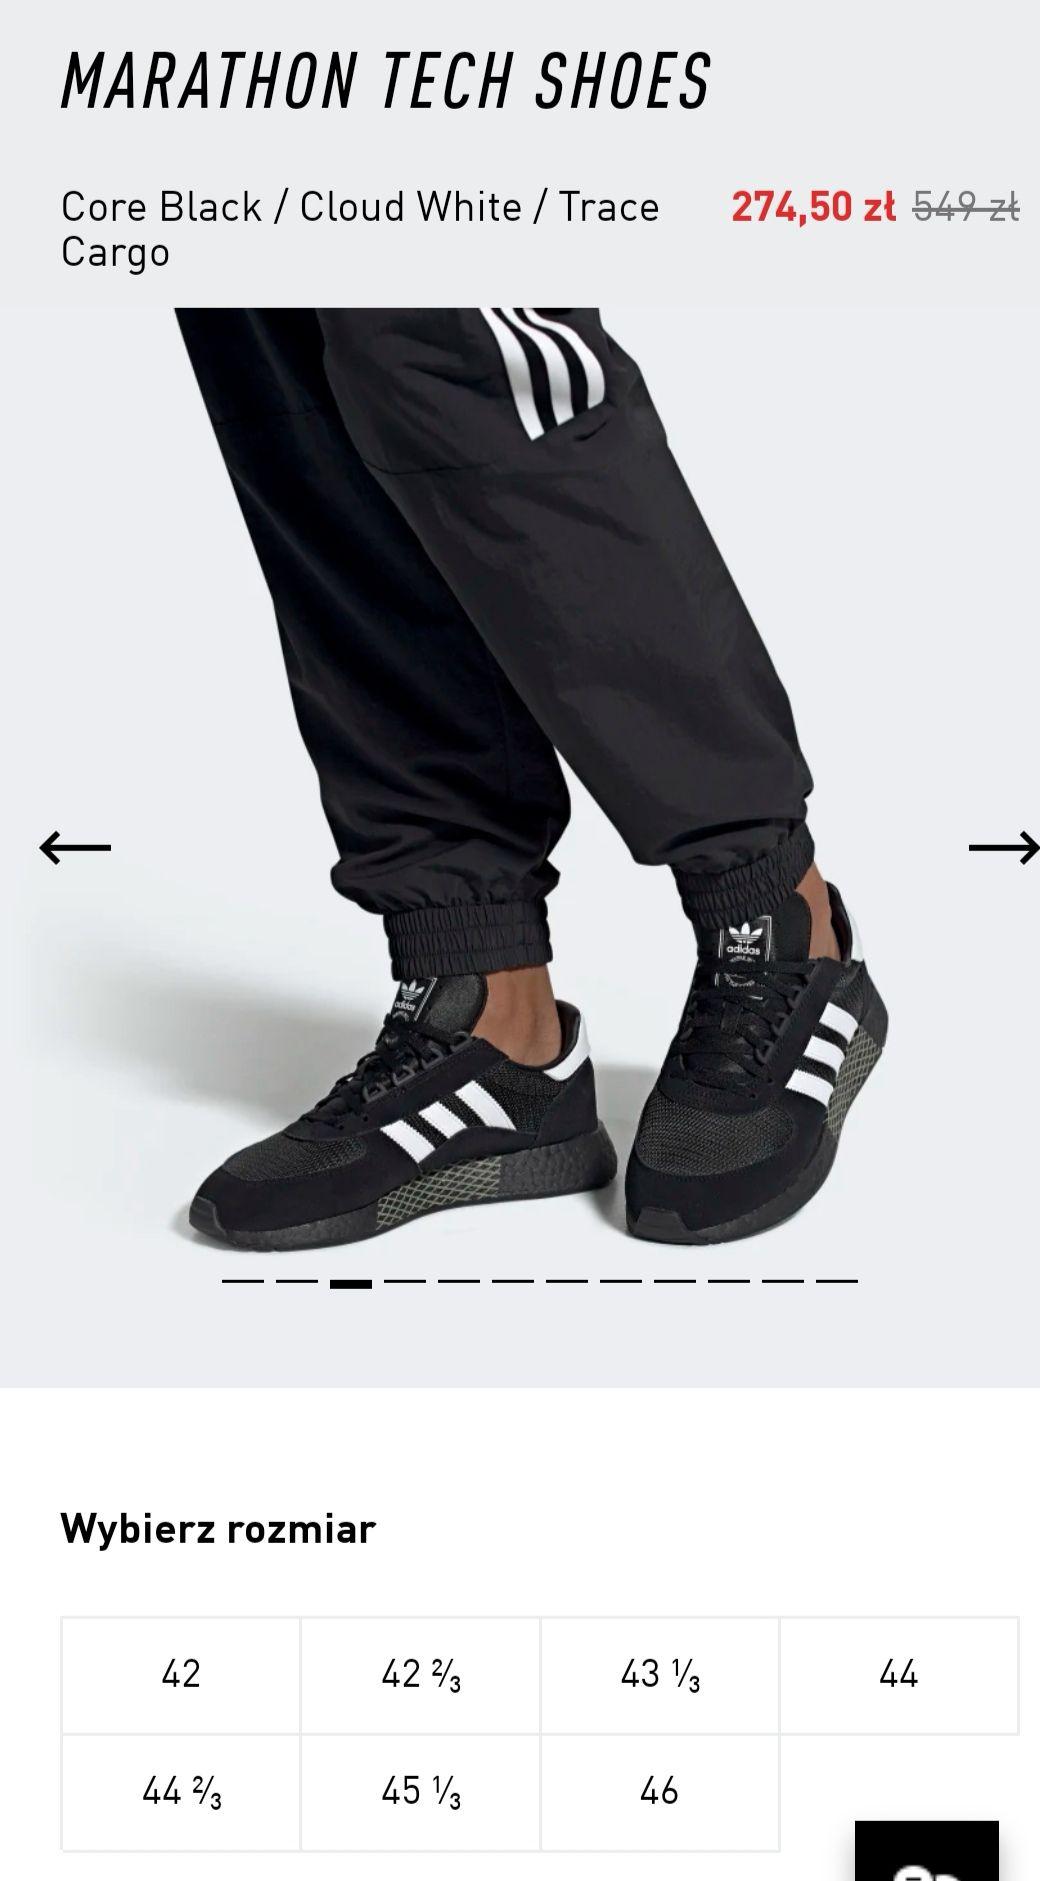 Adidas marathon tech shoes